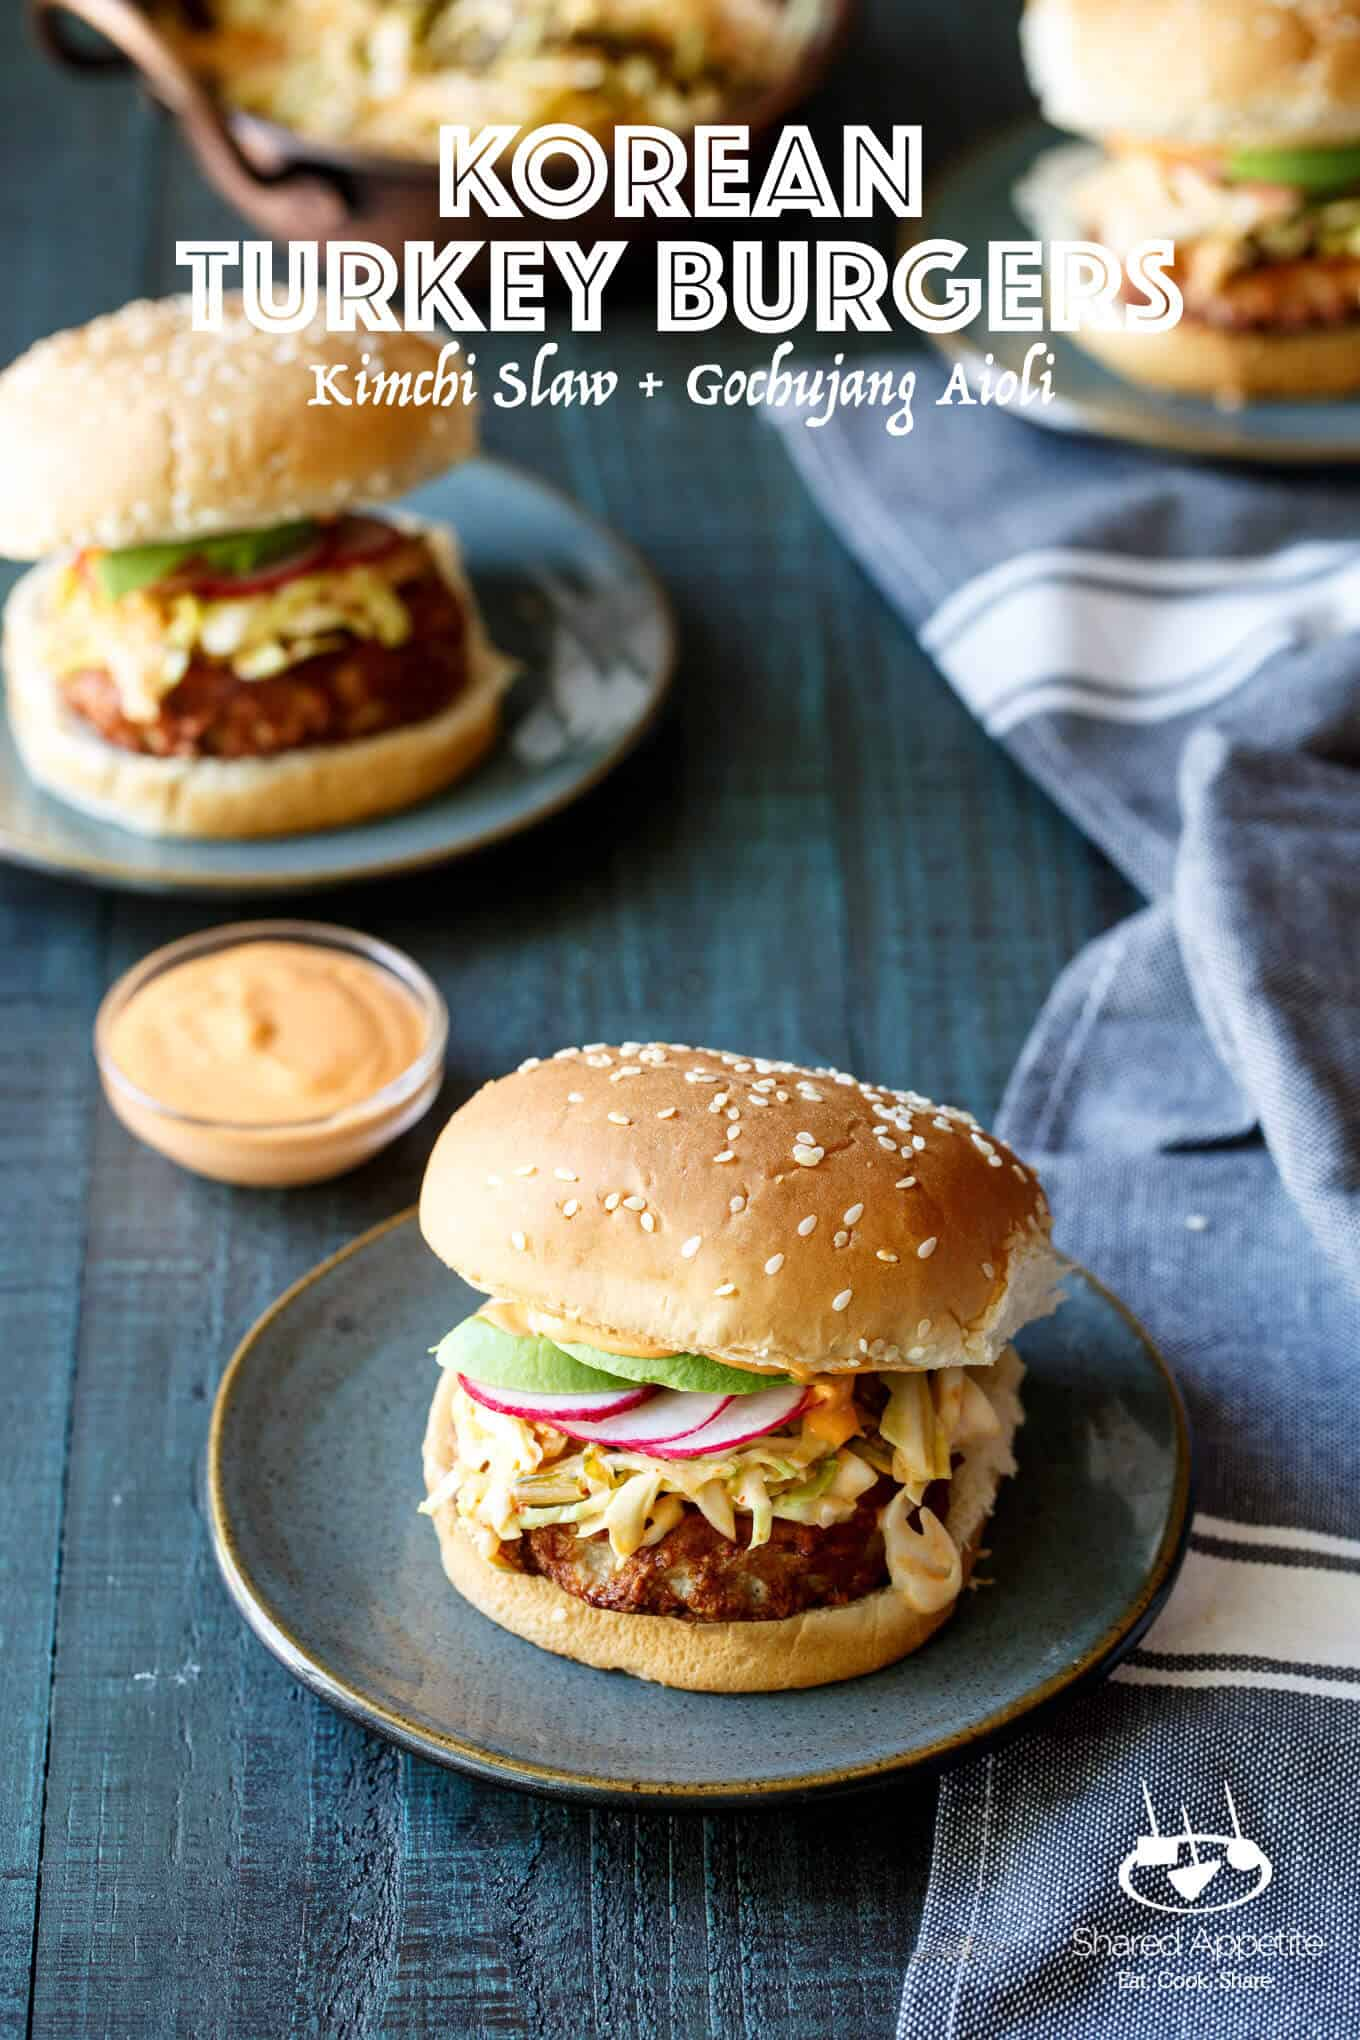 Korean Turkey Burgers with Kimchi Slaw, Avocado, and Gochujang Aioli   sharedappetite.com